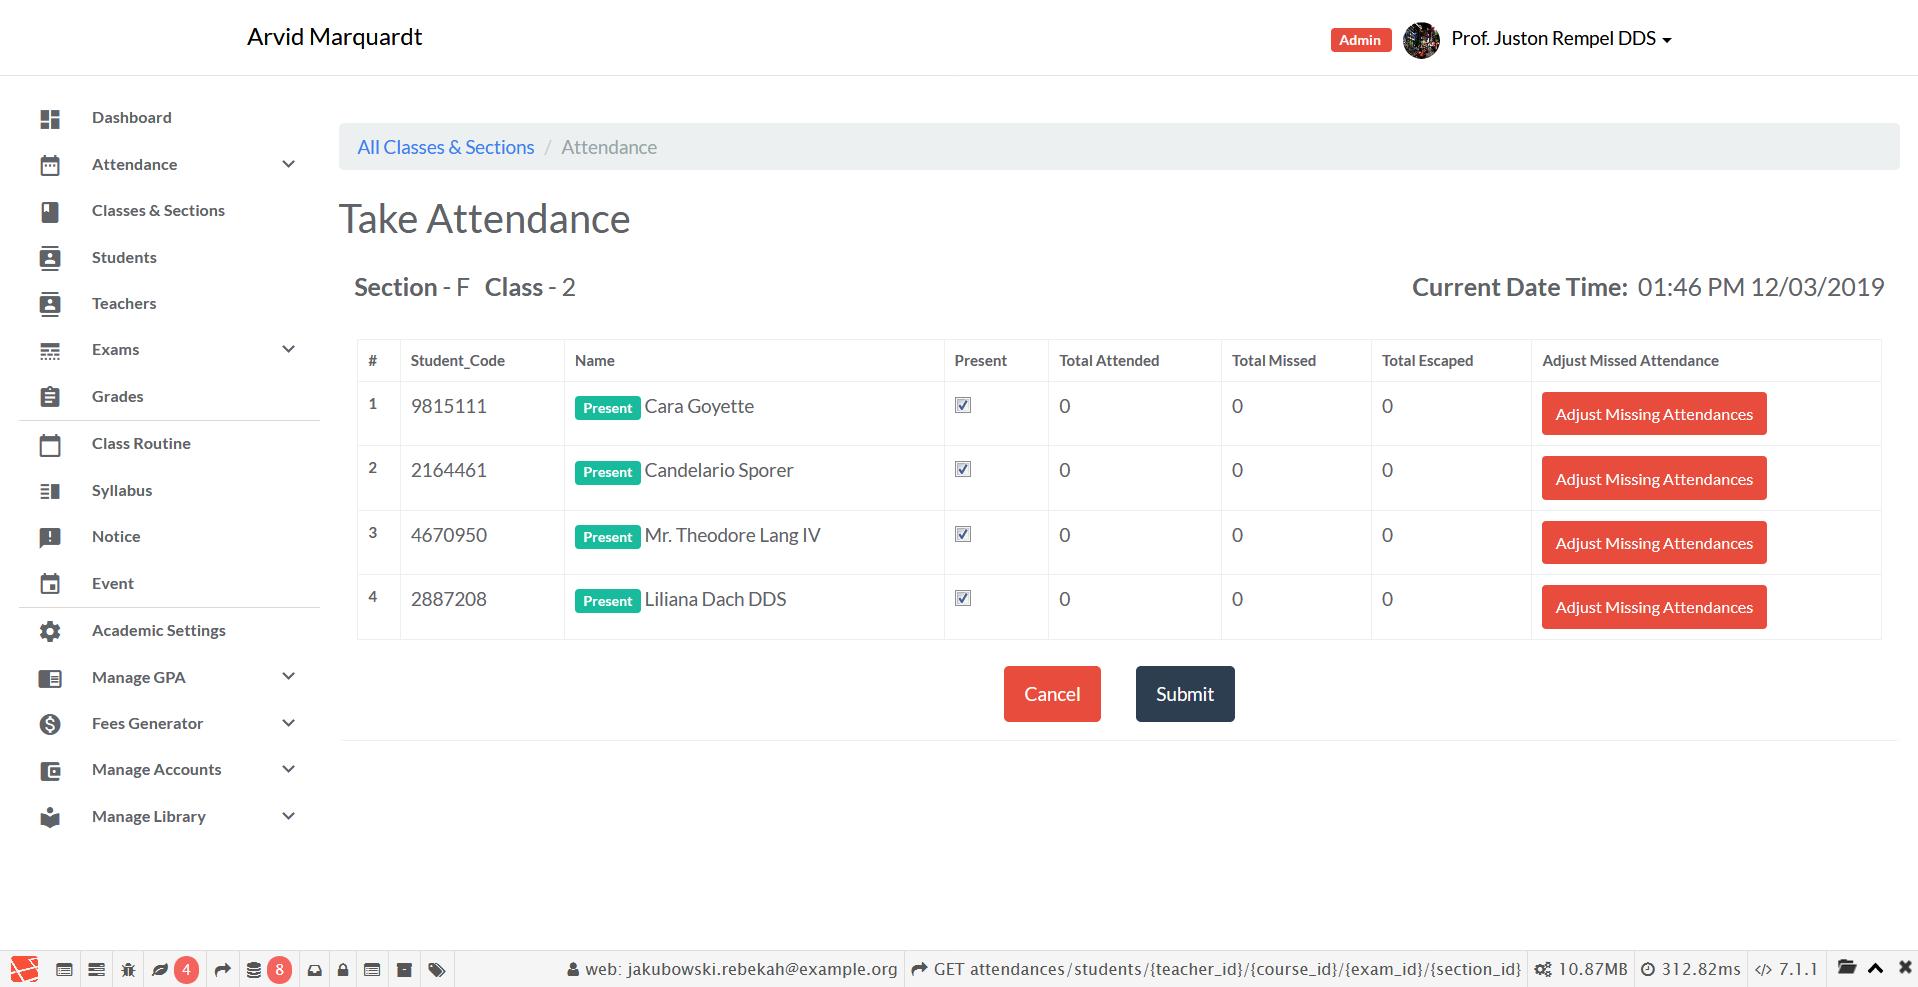 Screenshot_2019-03-12 Attendance - Arvid Marquardt